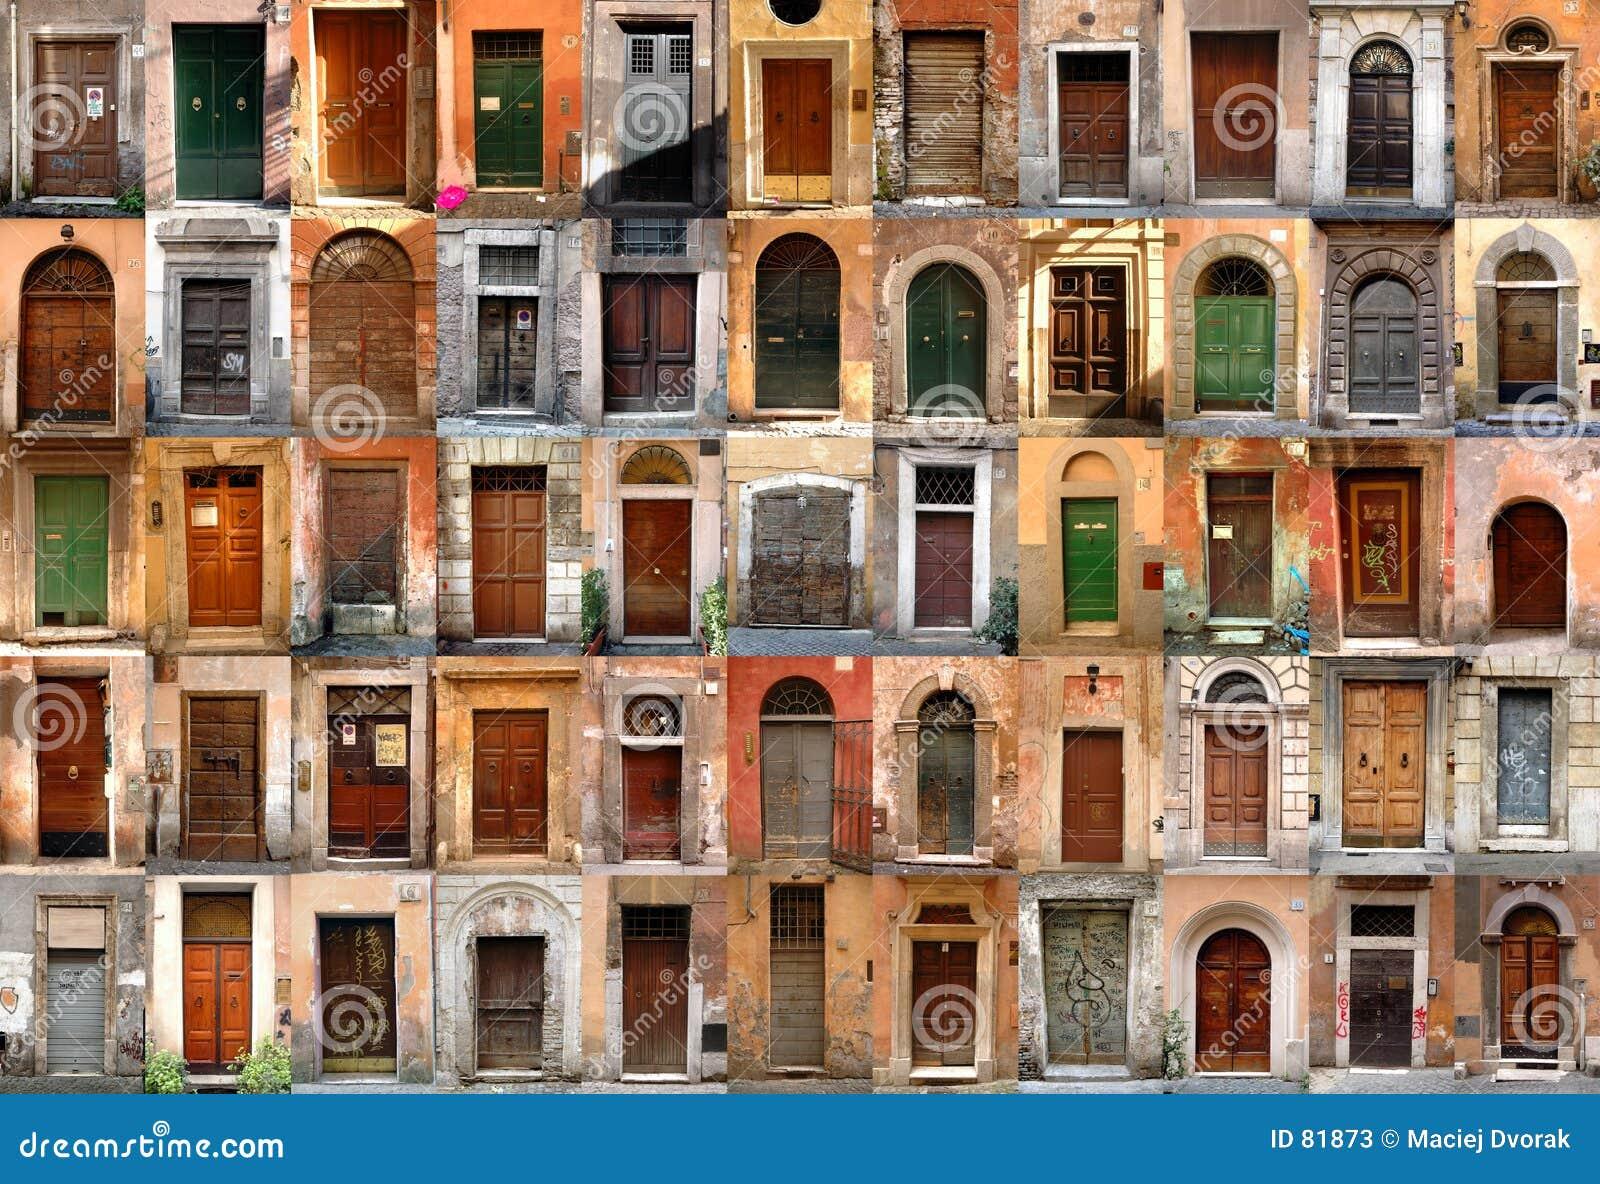 Doors - Rome, Italy Stock Photos - Image: 81873